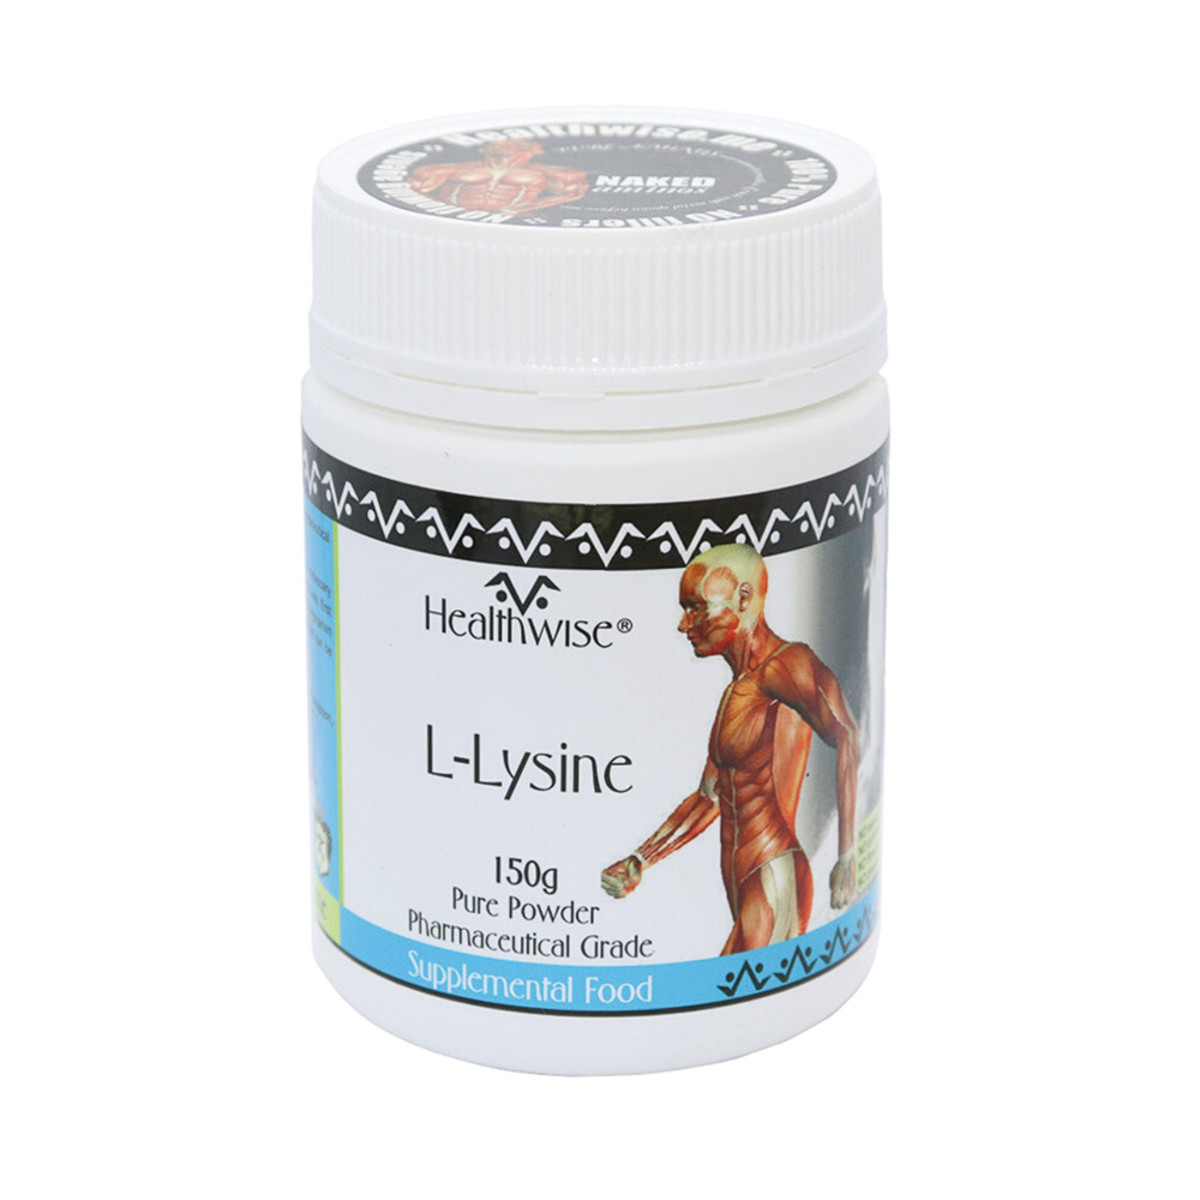 HEALTHWISE L-LYSINE 150G